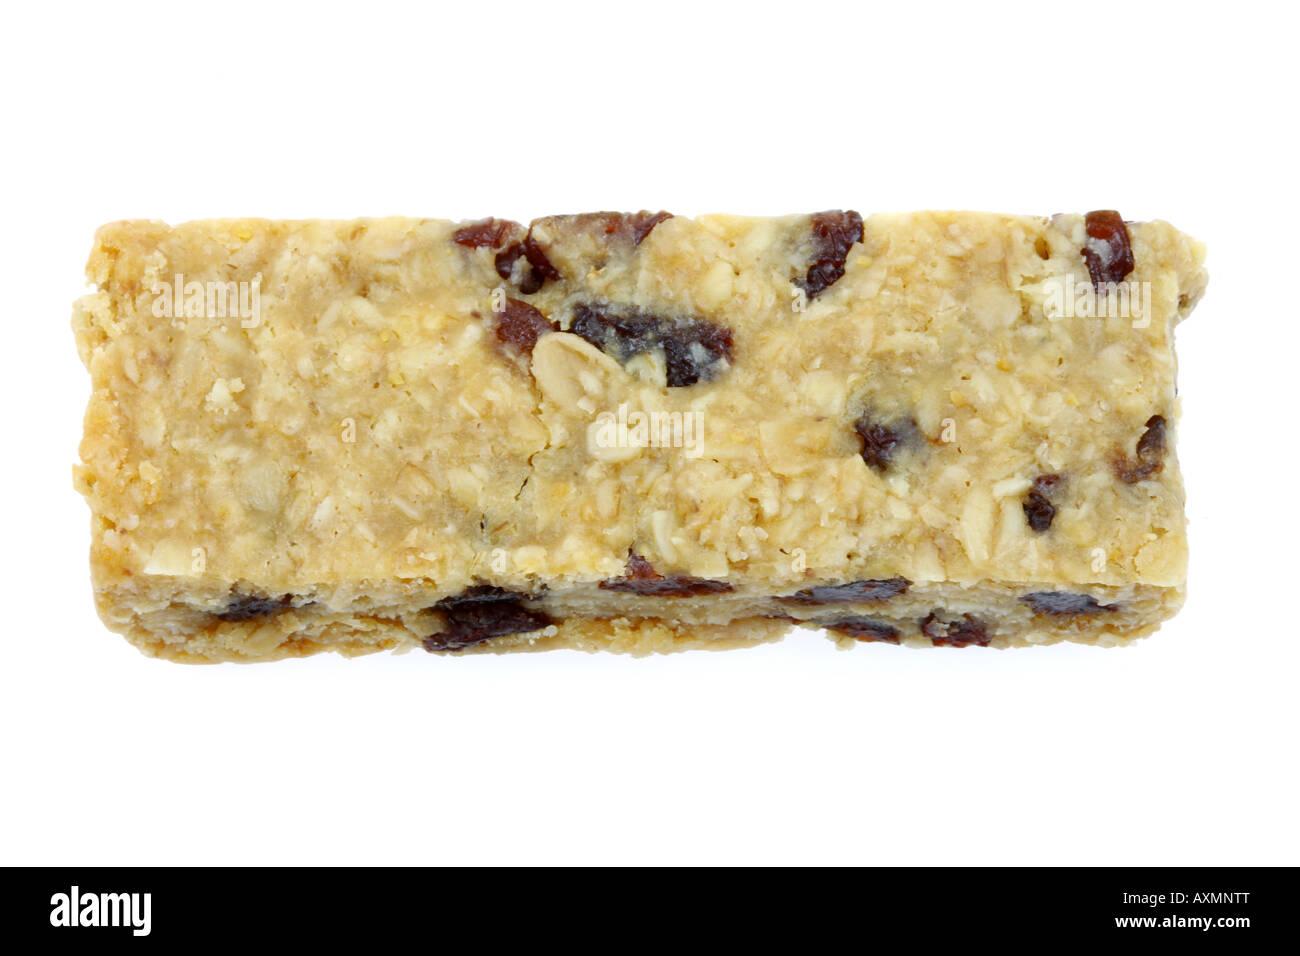 Nut and Raisin Flap Jack - Stock Image